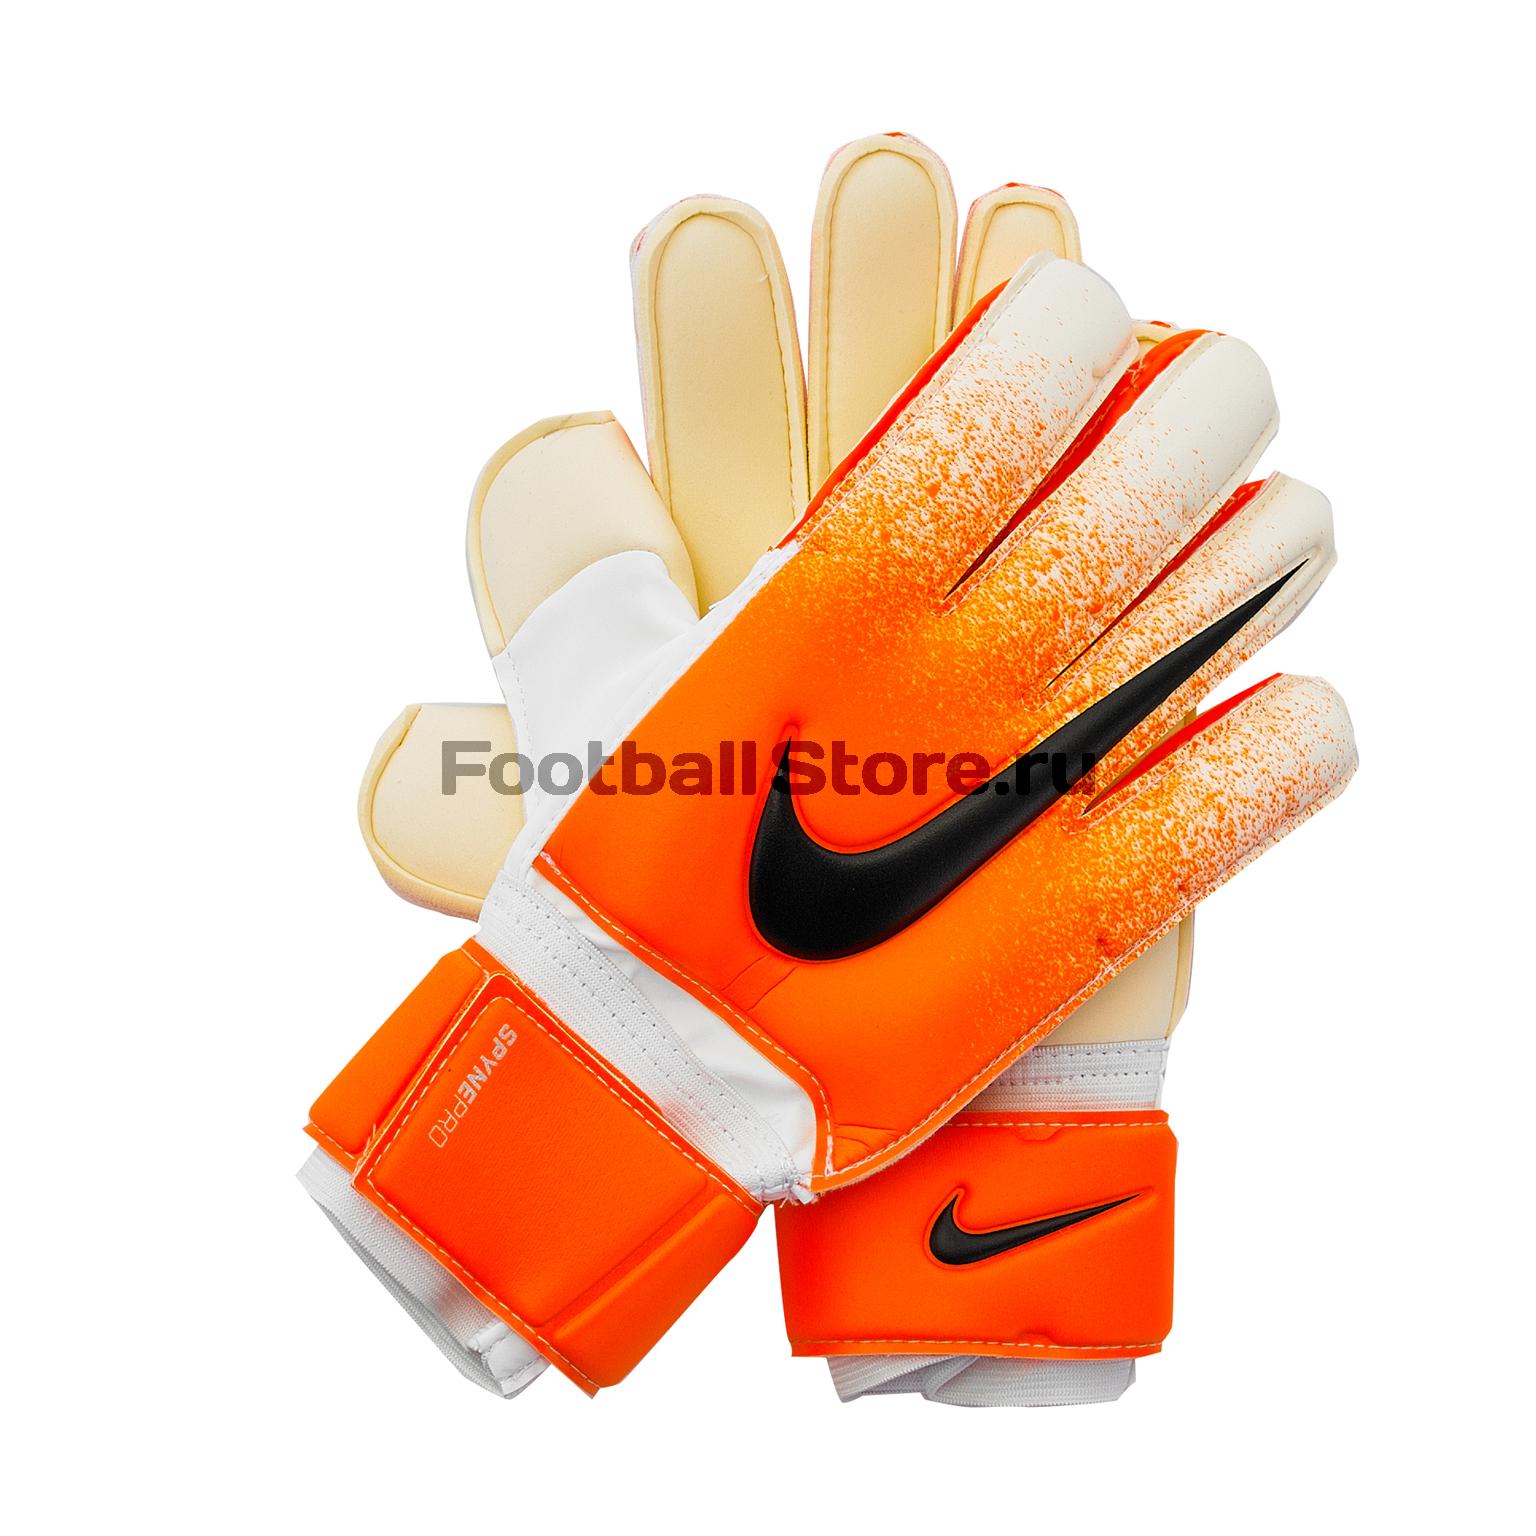 Перчатки вратарские Nike Spyne Pro GS3376-100 перчатки вратарские alphakeepers pro roll extreme p5 1465 010